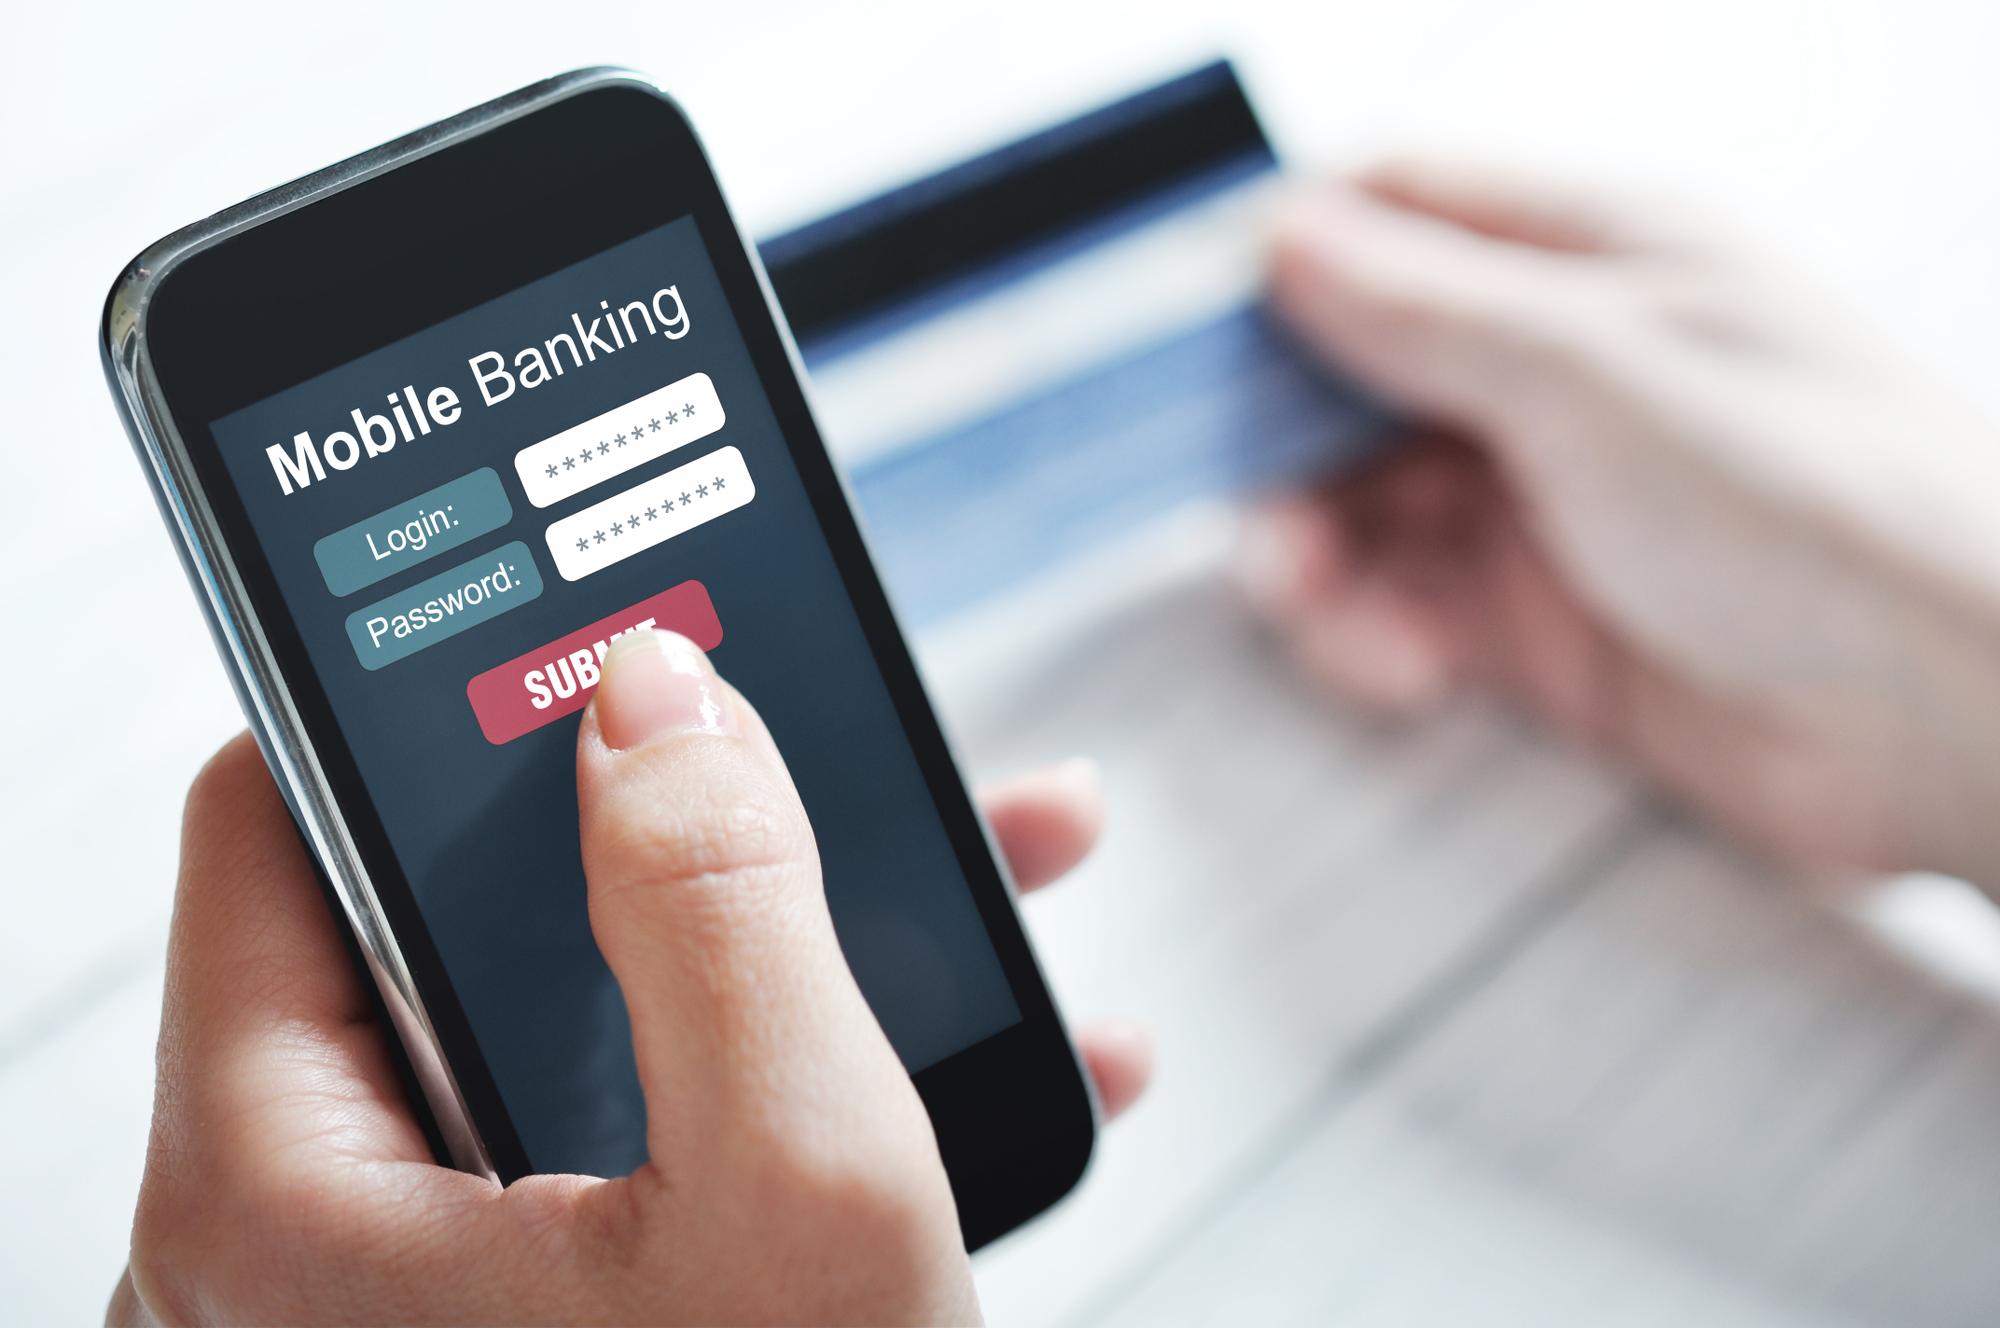 Bank Application testing